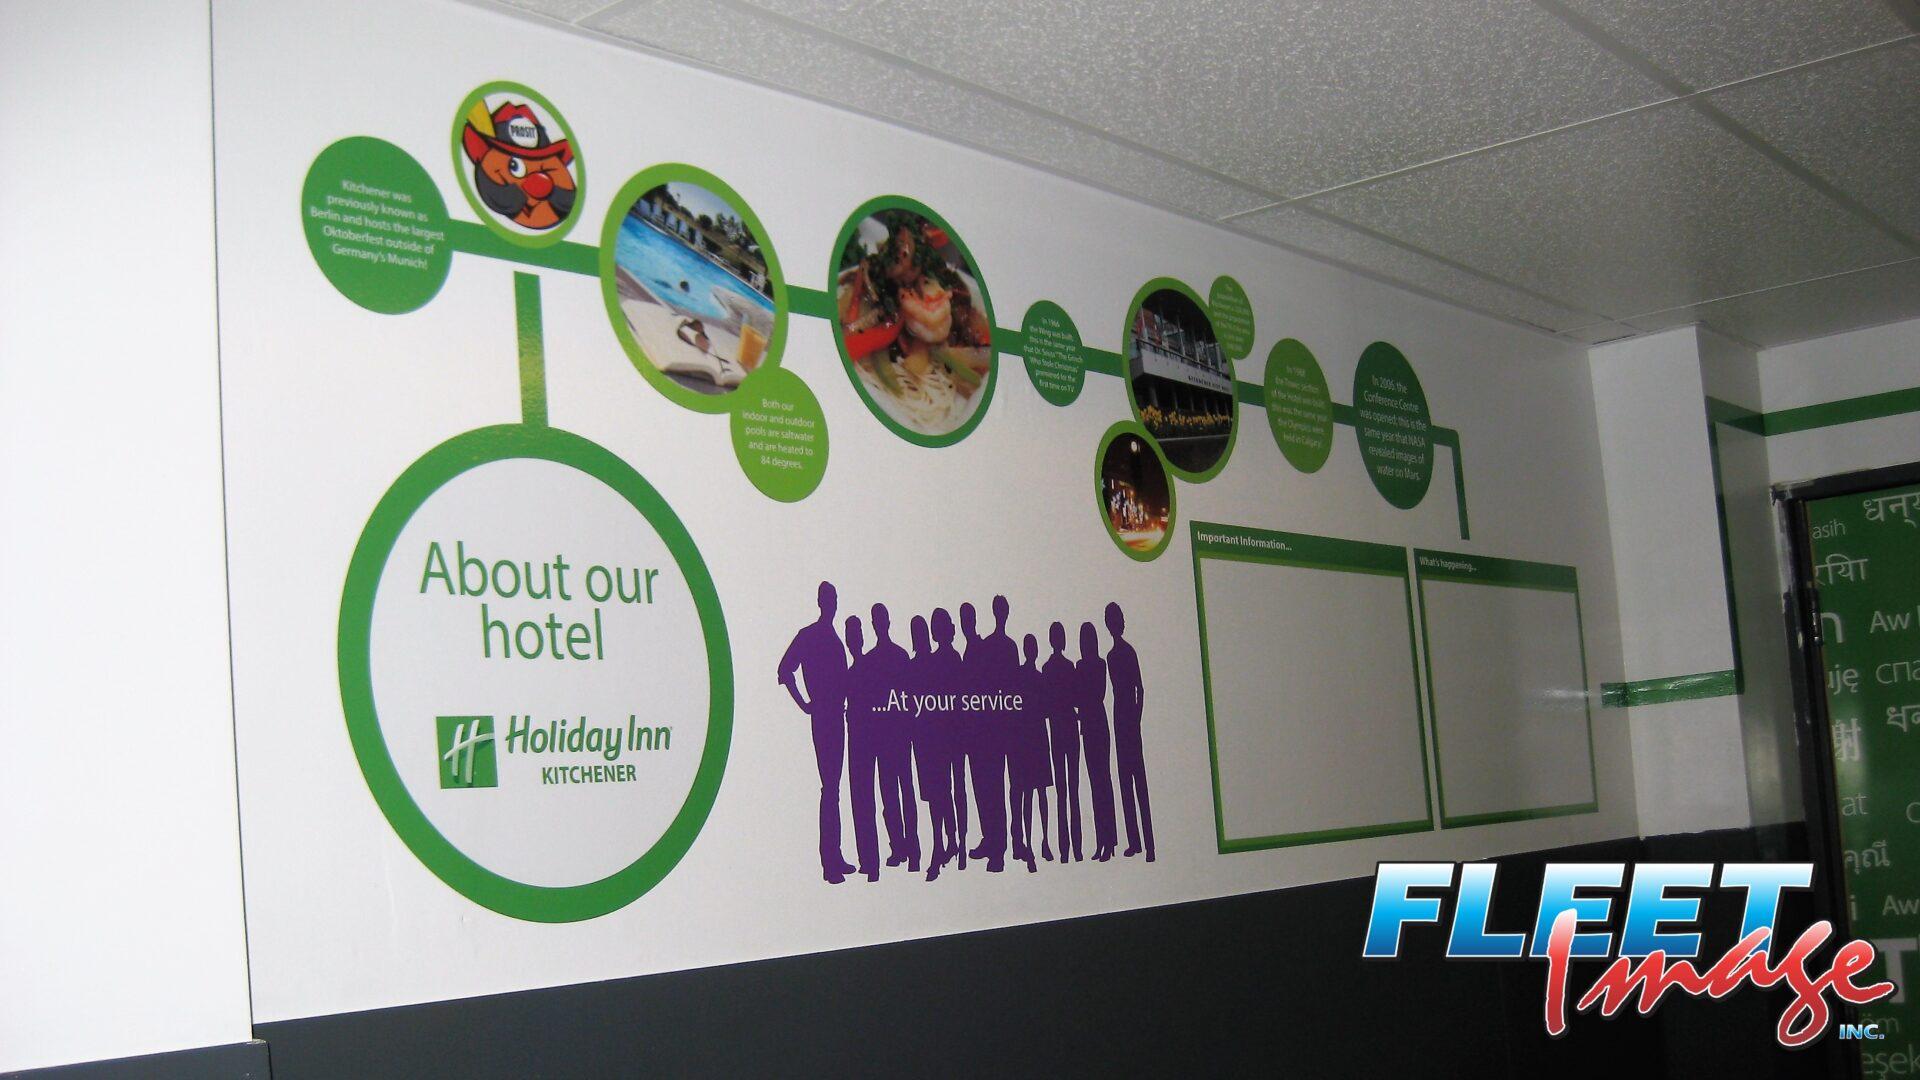 Wall art of Holiday Inn